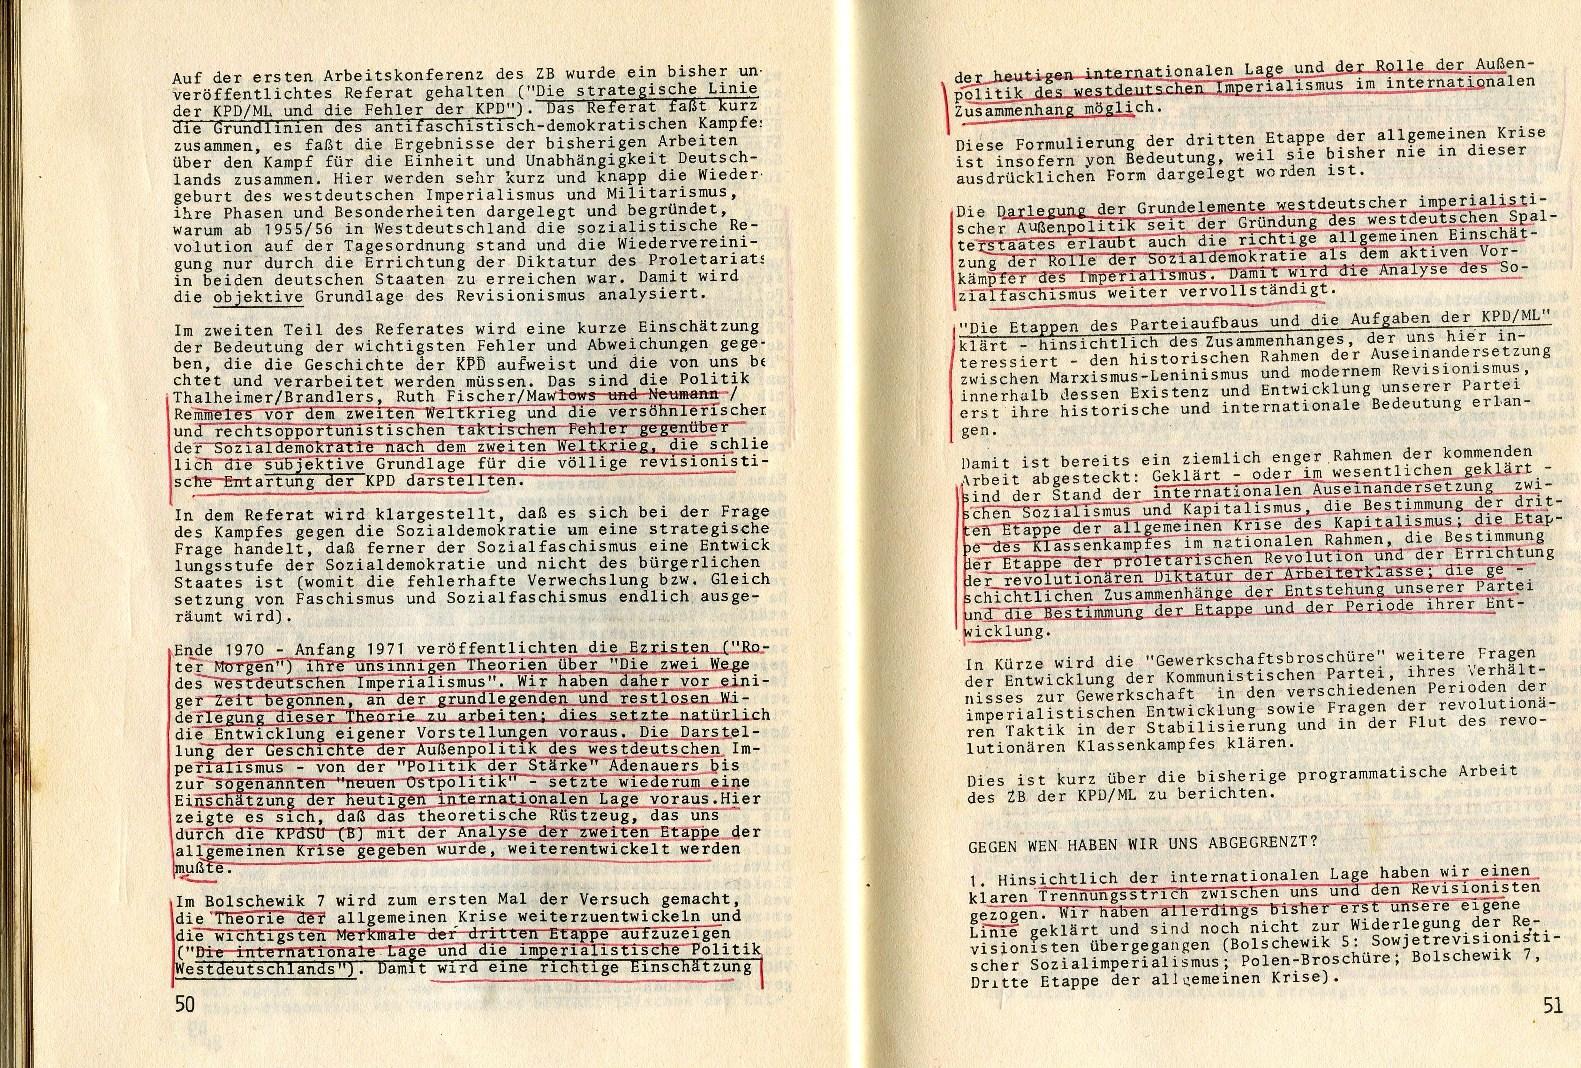 ZB_Parteiarbeiter_1971_05_27